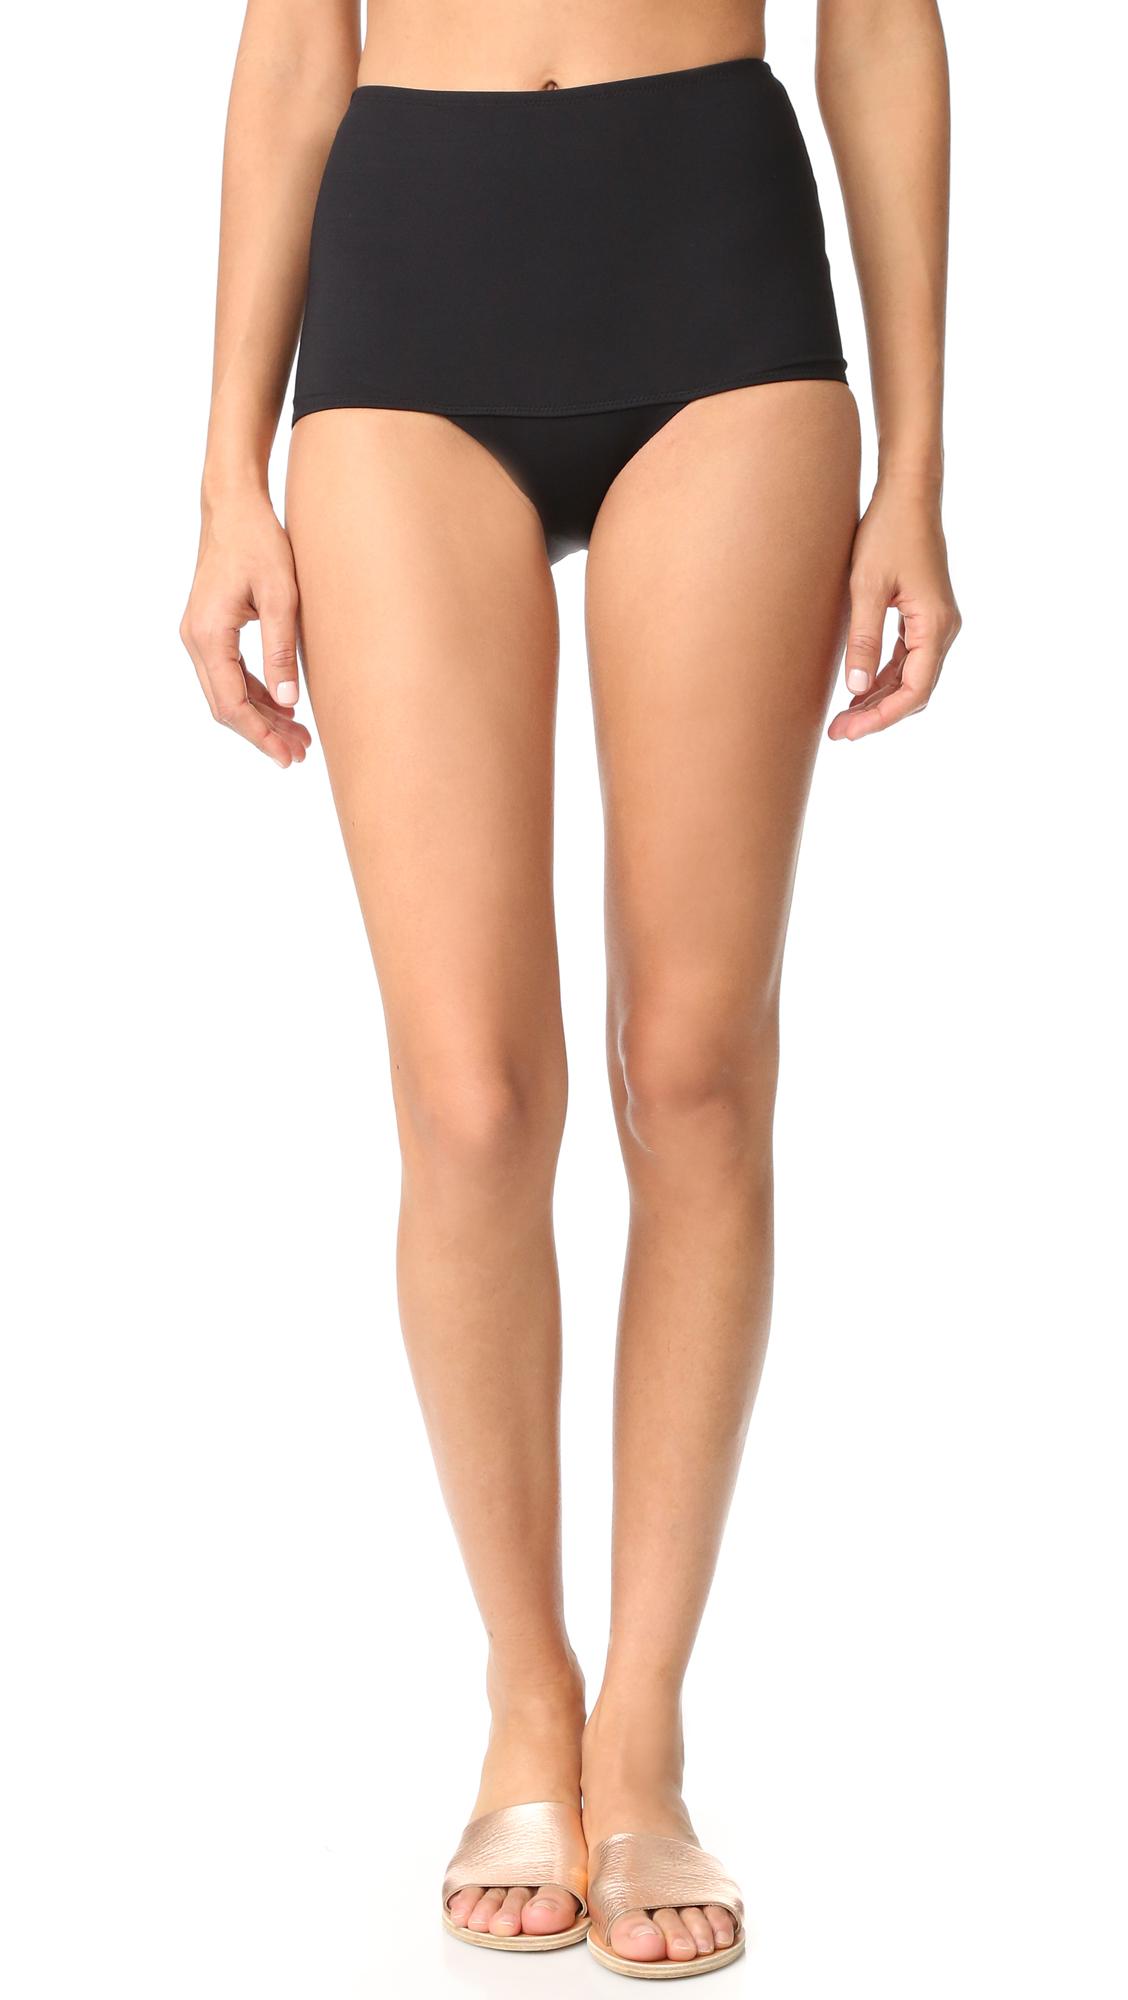 Kore Swim Electra High Waist Bikini Bottoms - Onyx at Shopbop